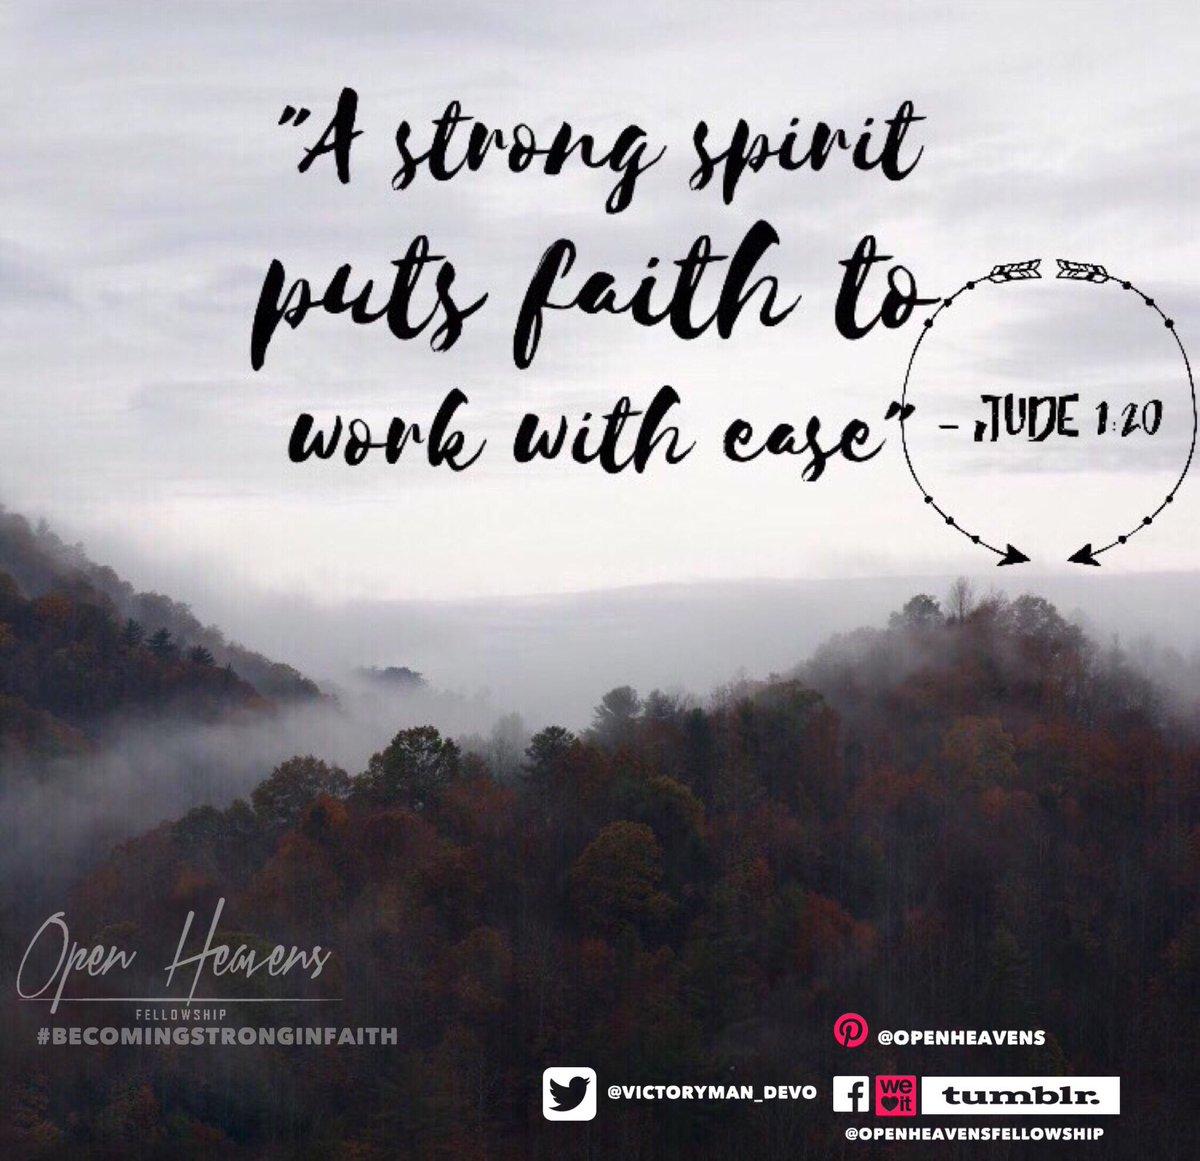 Christian Sayings About God Tumblr Jpg 1200x1161